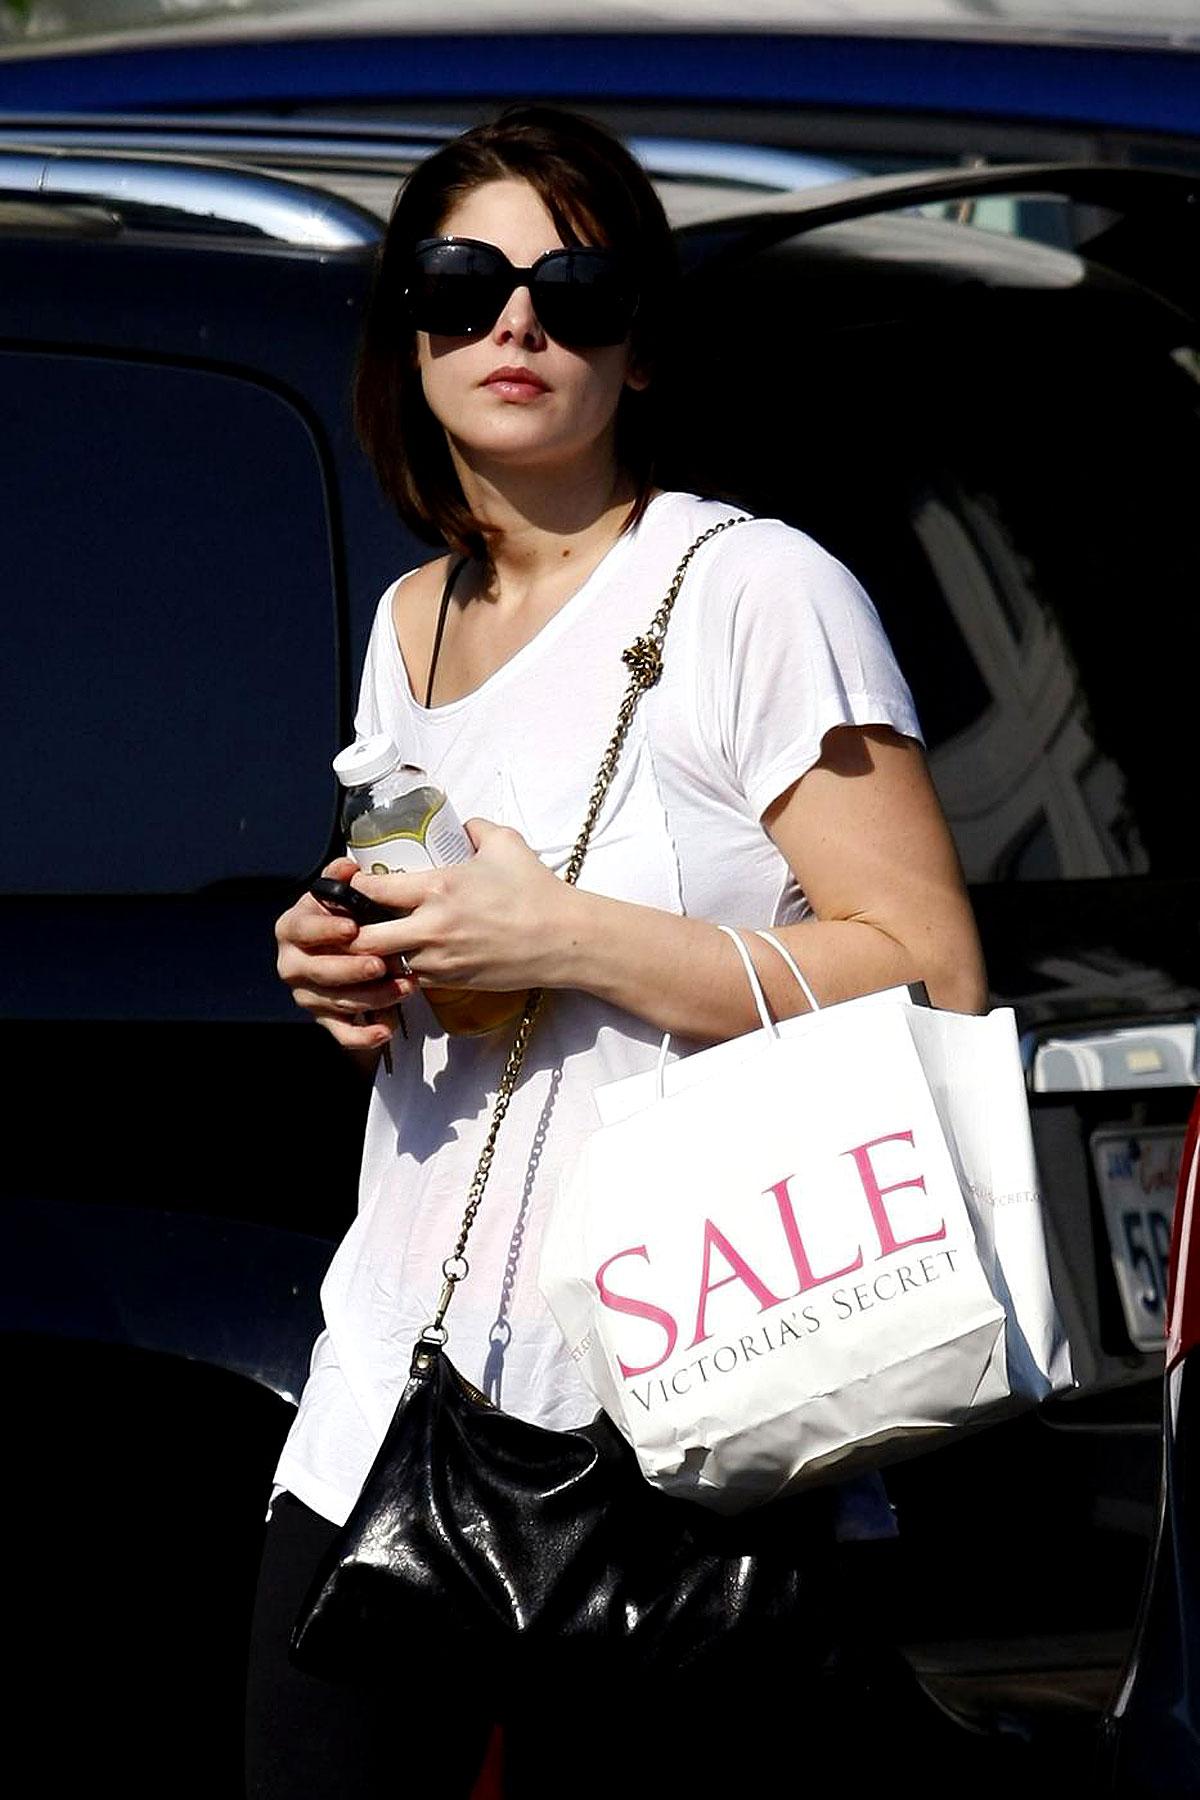 PHOTO GALLERY: Ashley Greene Heads to a Photo Shoot